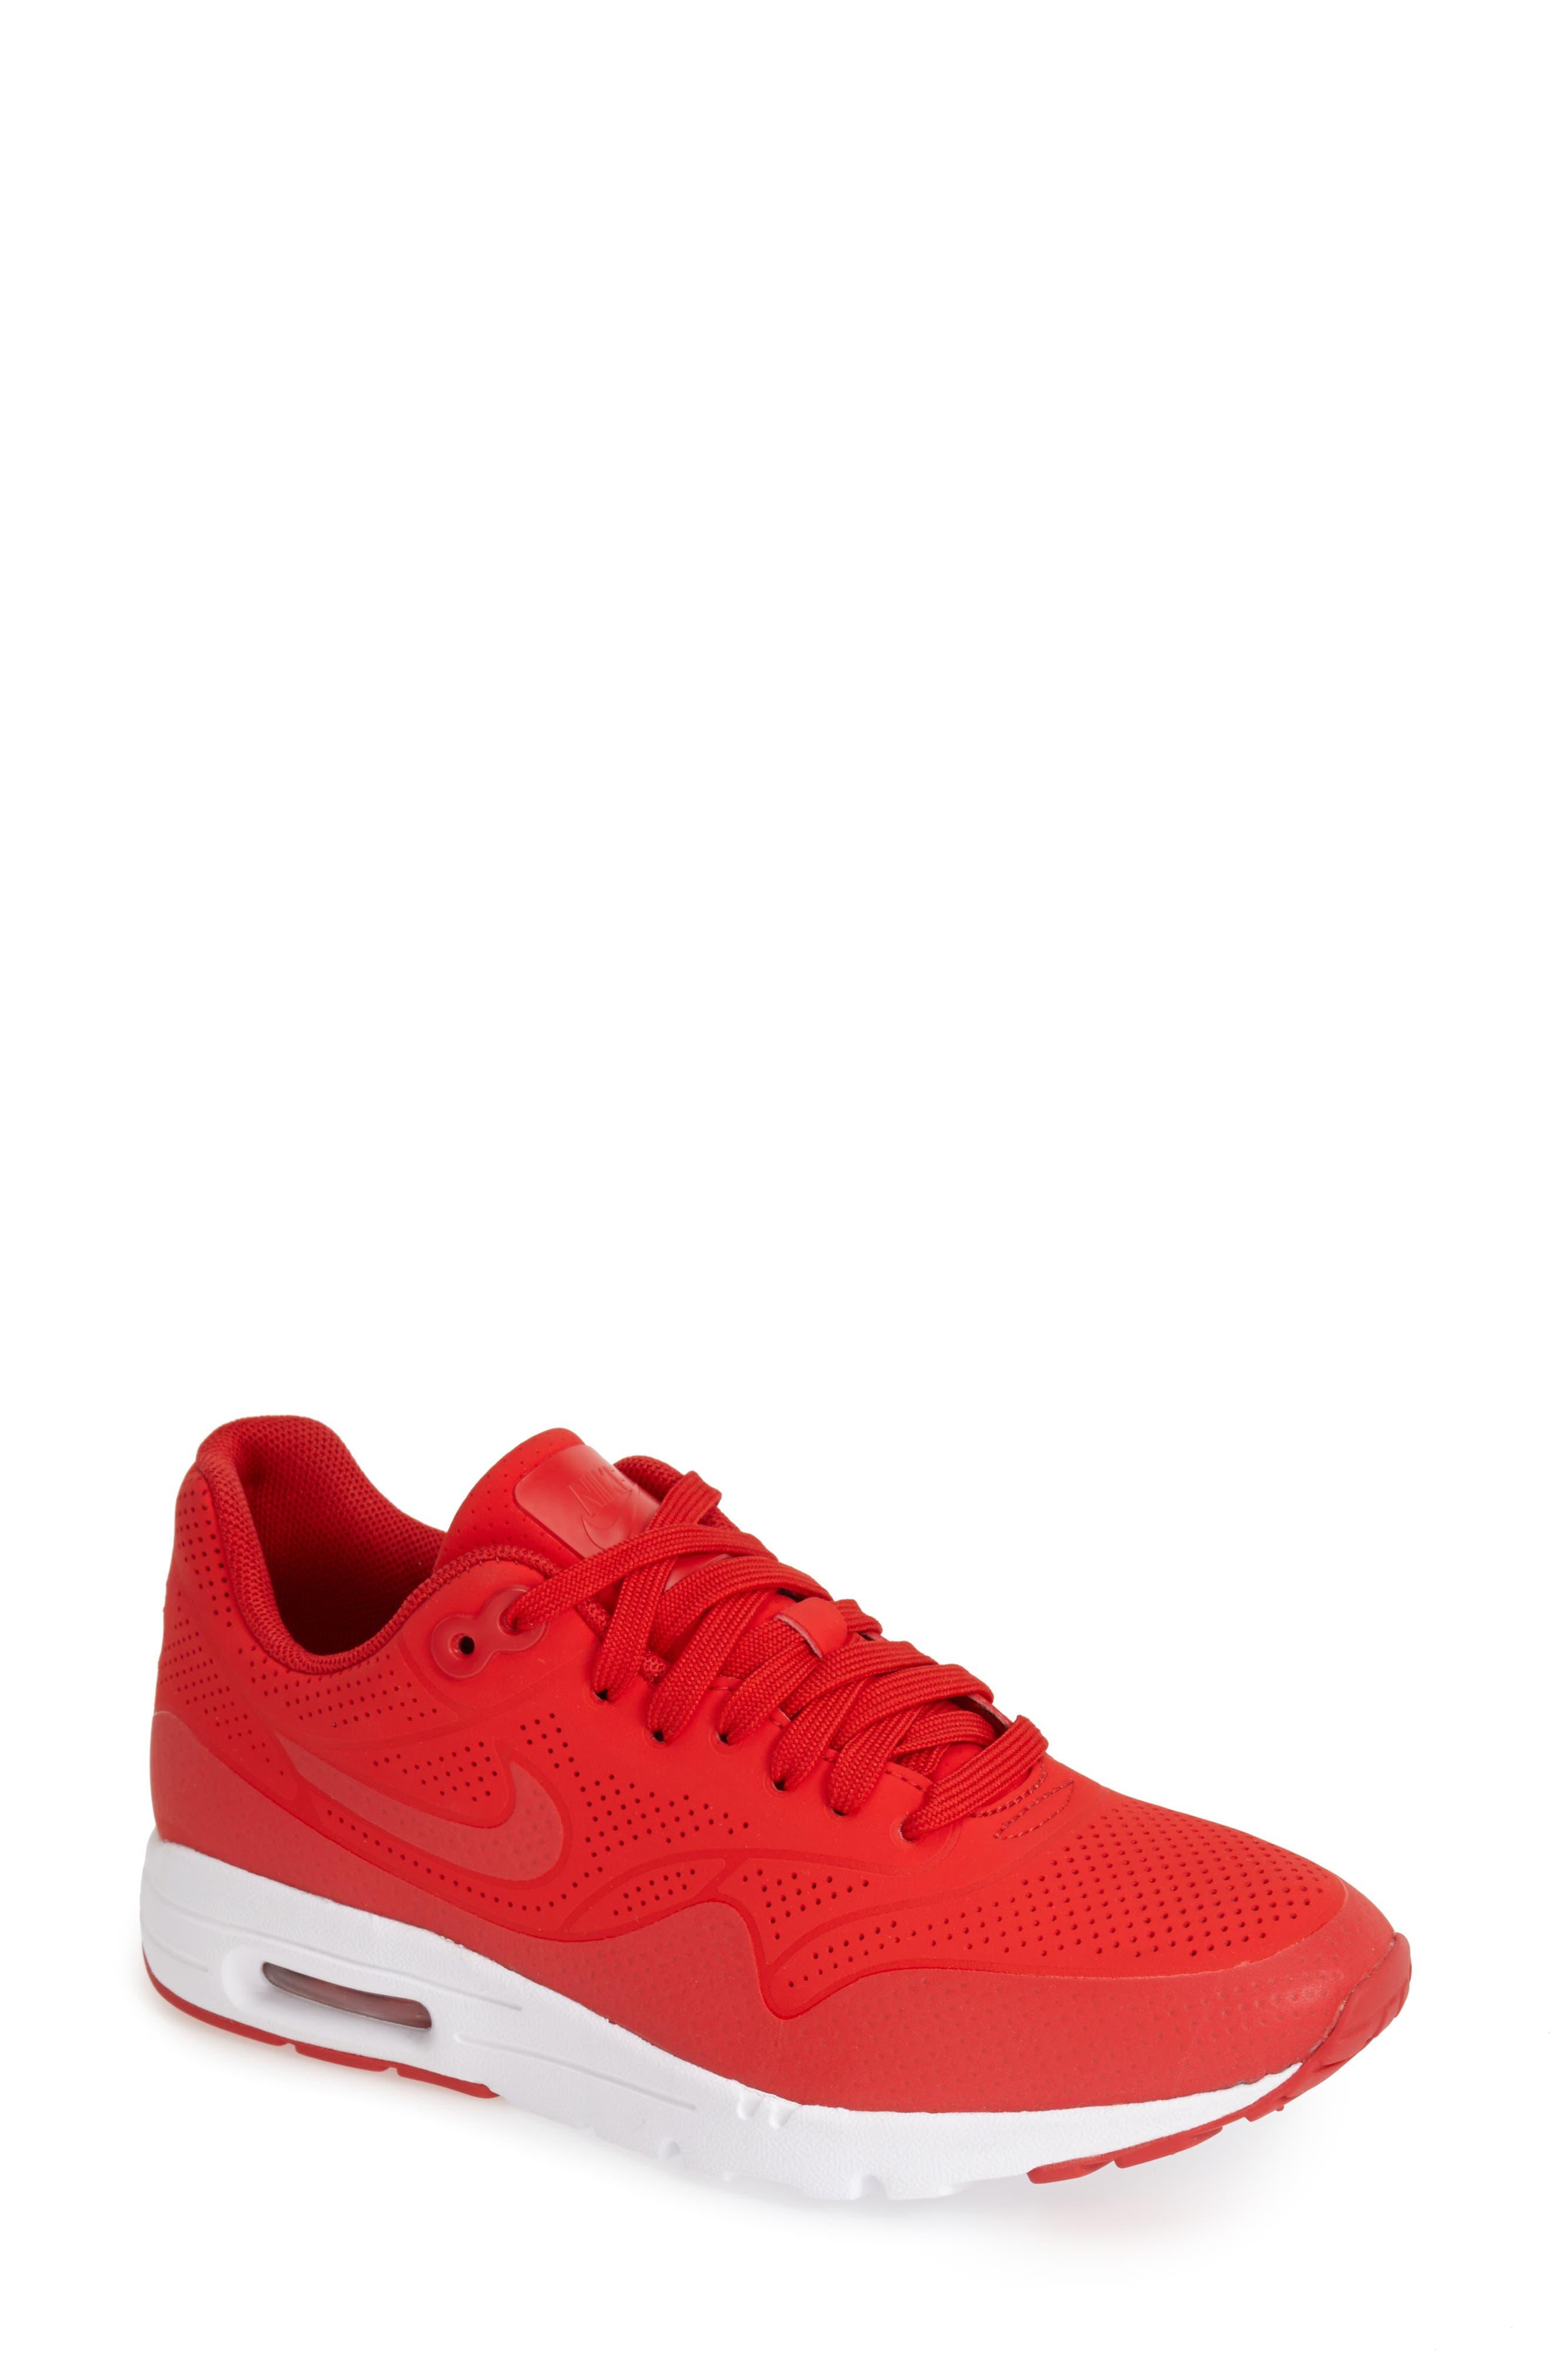 ,                             'Air Max 1 - Ultra Moire' Sneaker,                             Alternate thumbnail 102, color,                             600